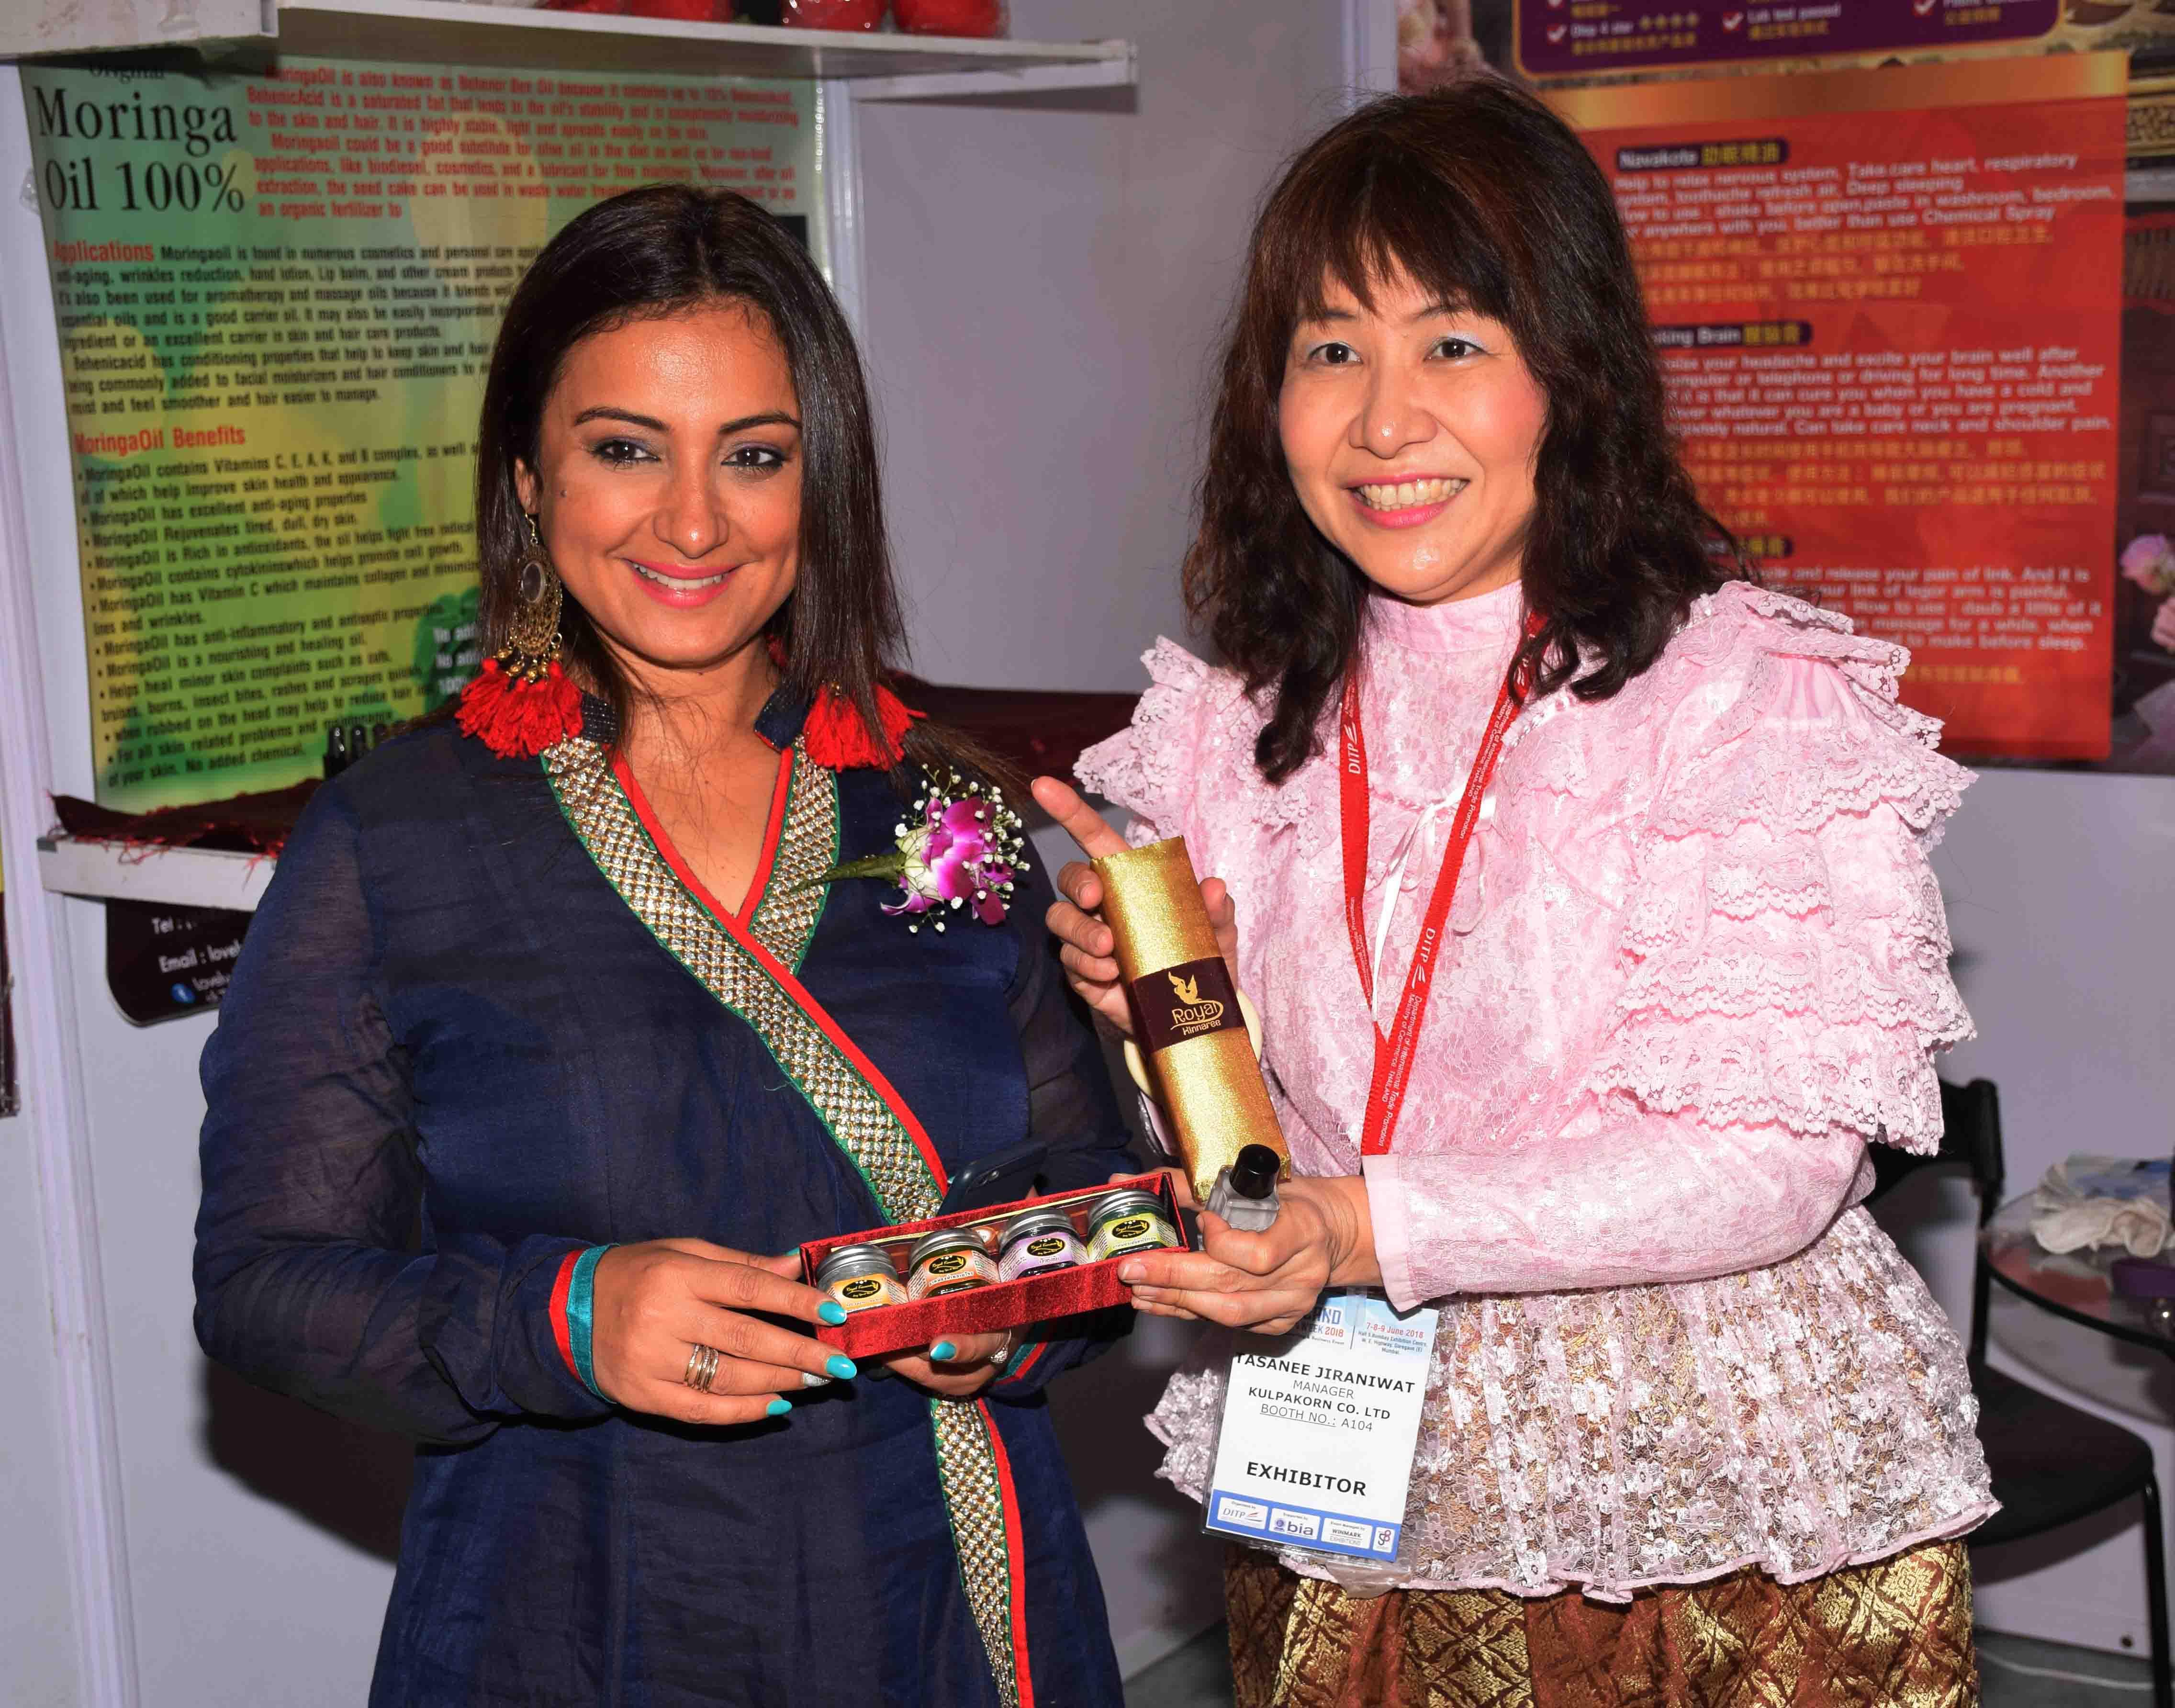 Bollywood actress Divya Dutta inaugurated the Thailand Week 2018 at Bombay Exhibition Centre, Goregaon in Mumbai4